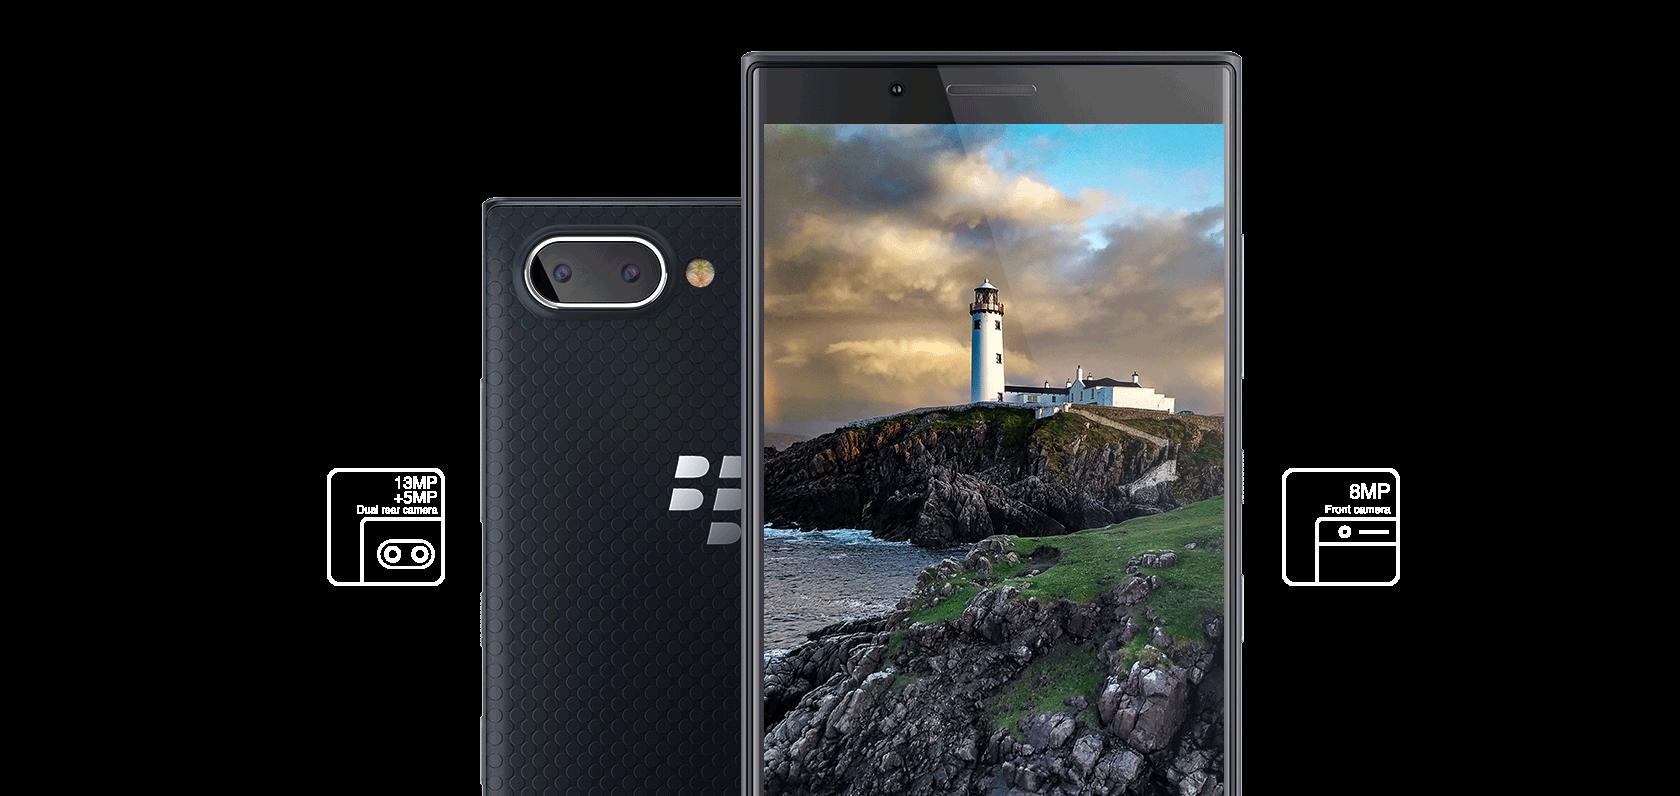 dualcamera2 - BlackBerry KEY 2 LE